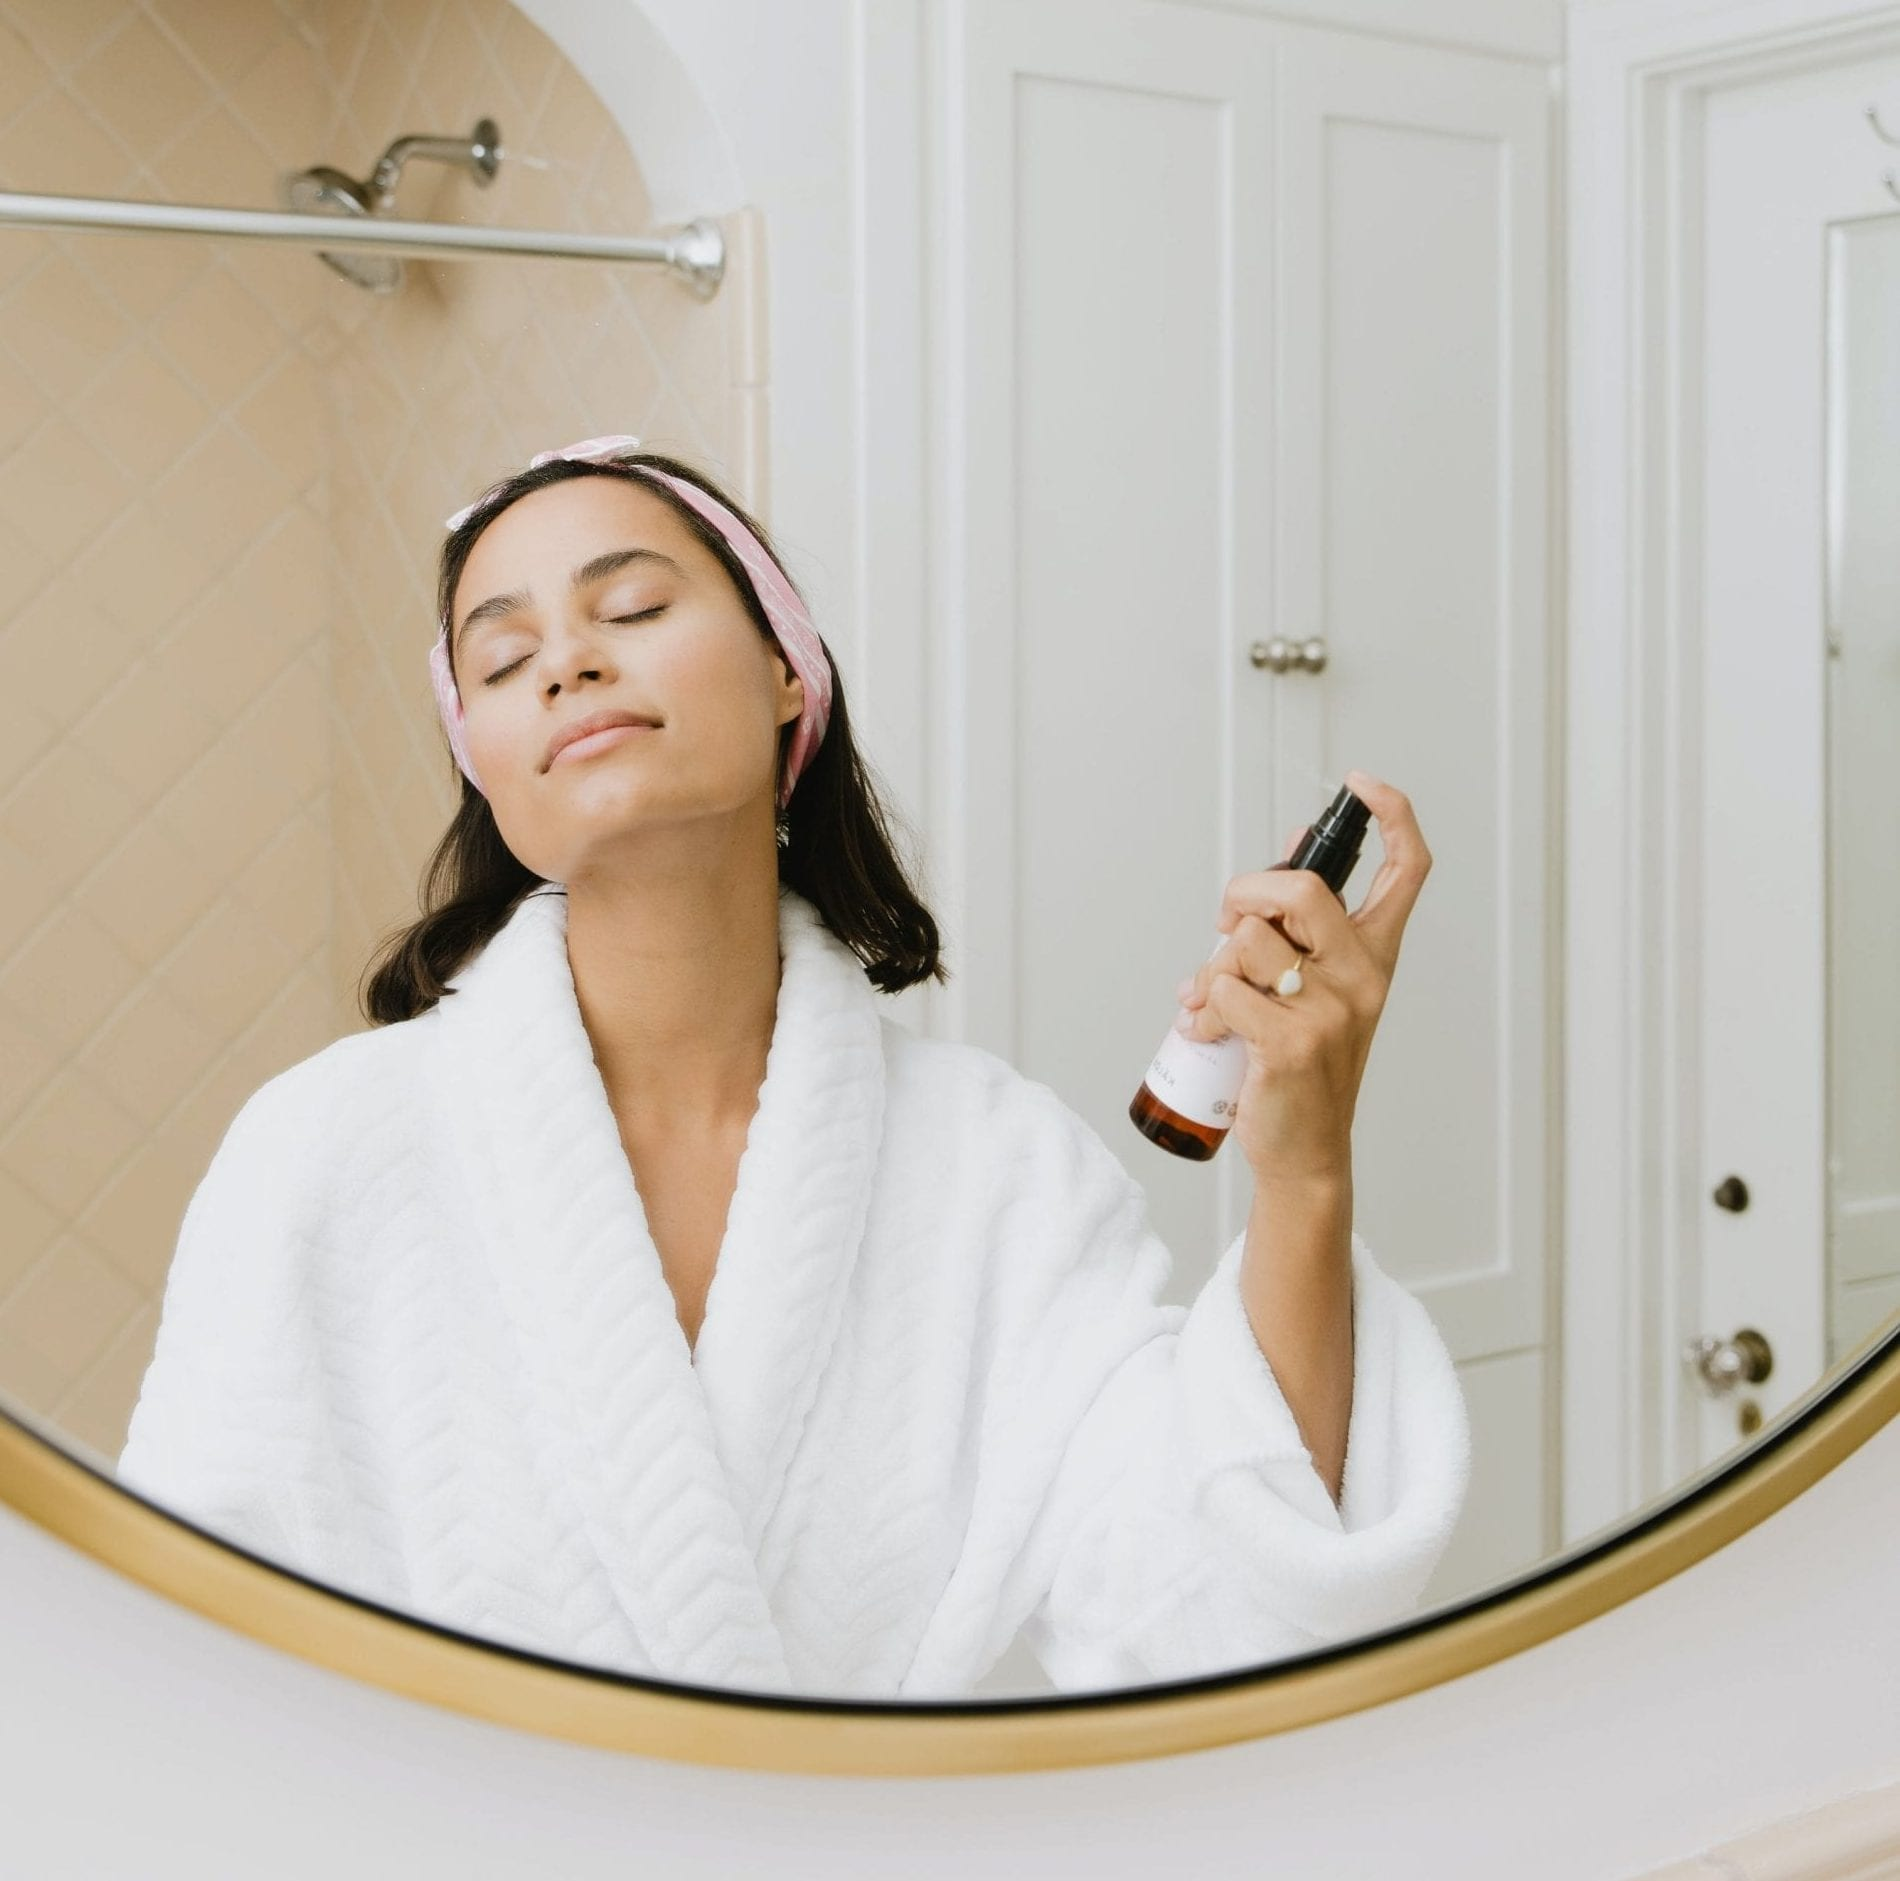 woman applying beauty product